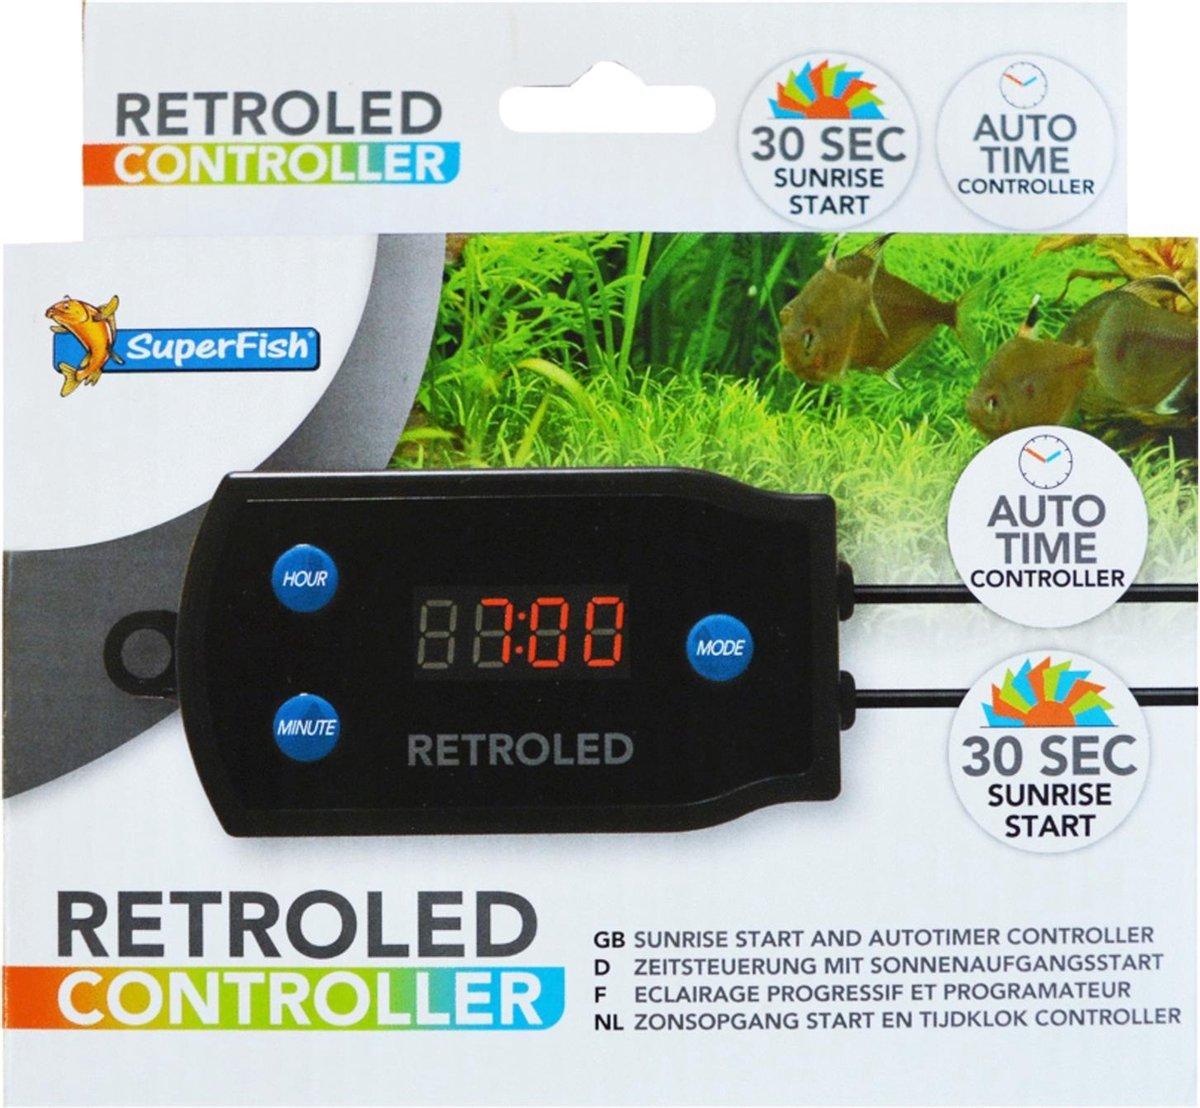 Superfish RetroLed Controller - SuperFish